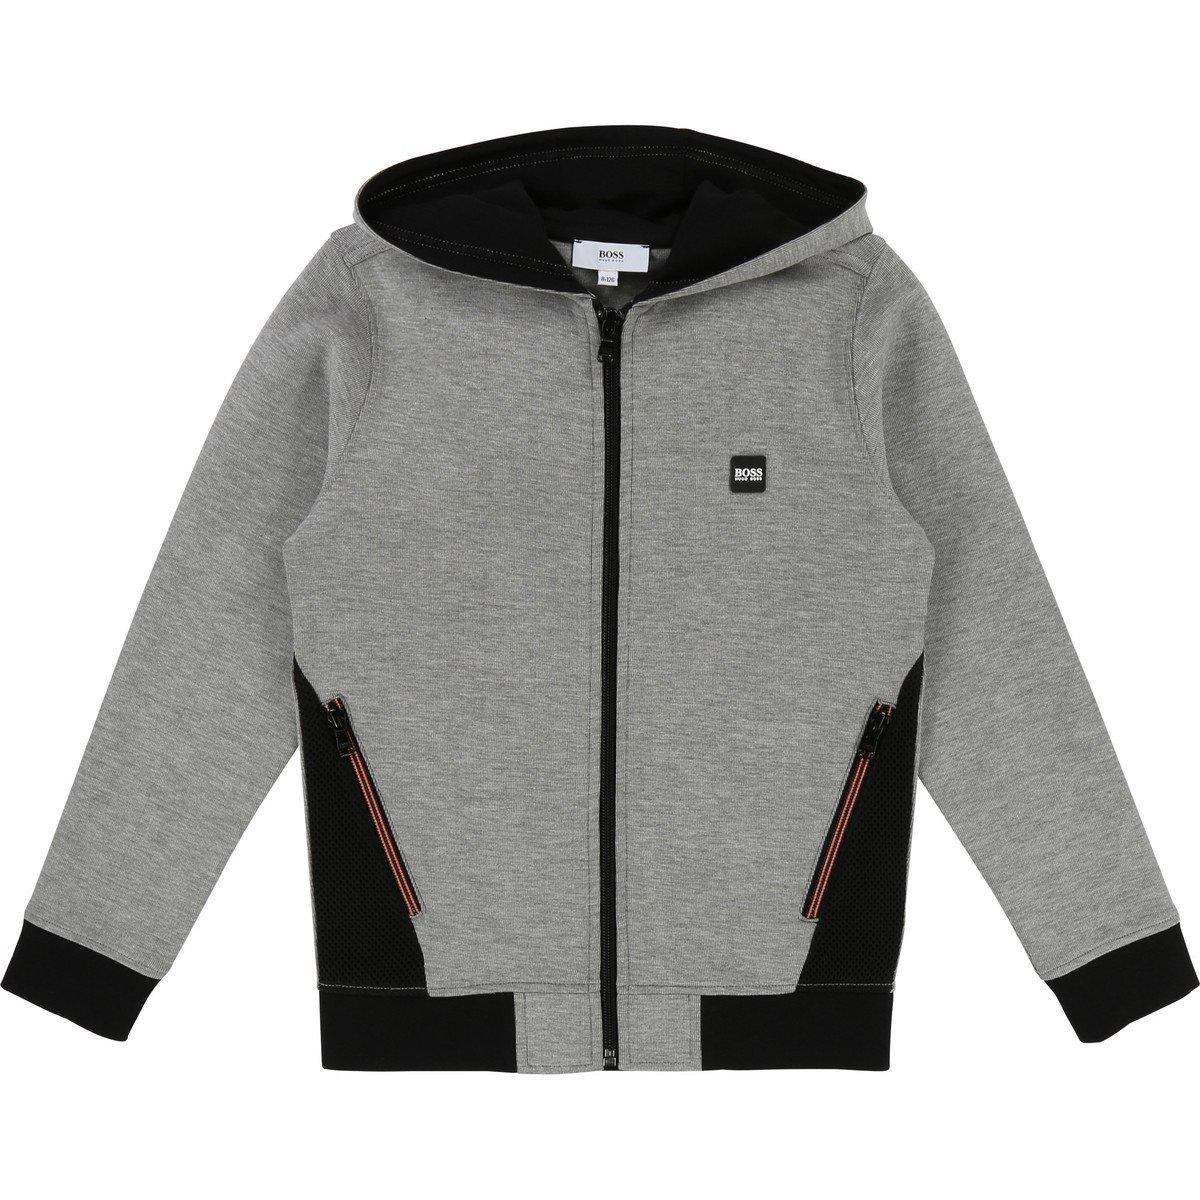 Hugo Boss Kids Boys Full Zip Hoodie Cardigan Sweater 5 Years